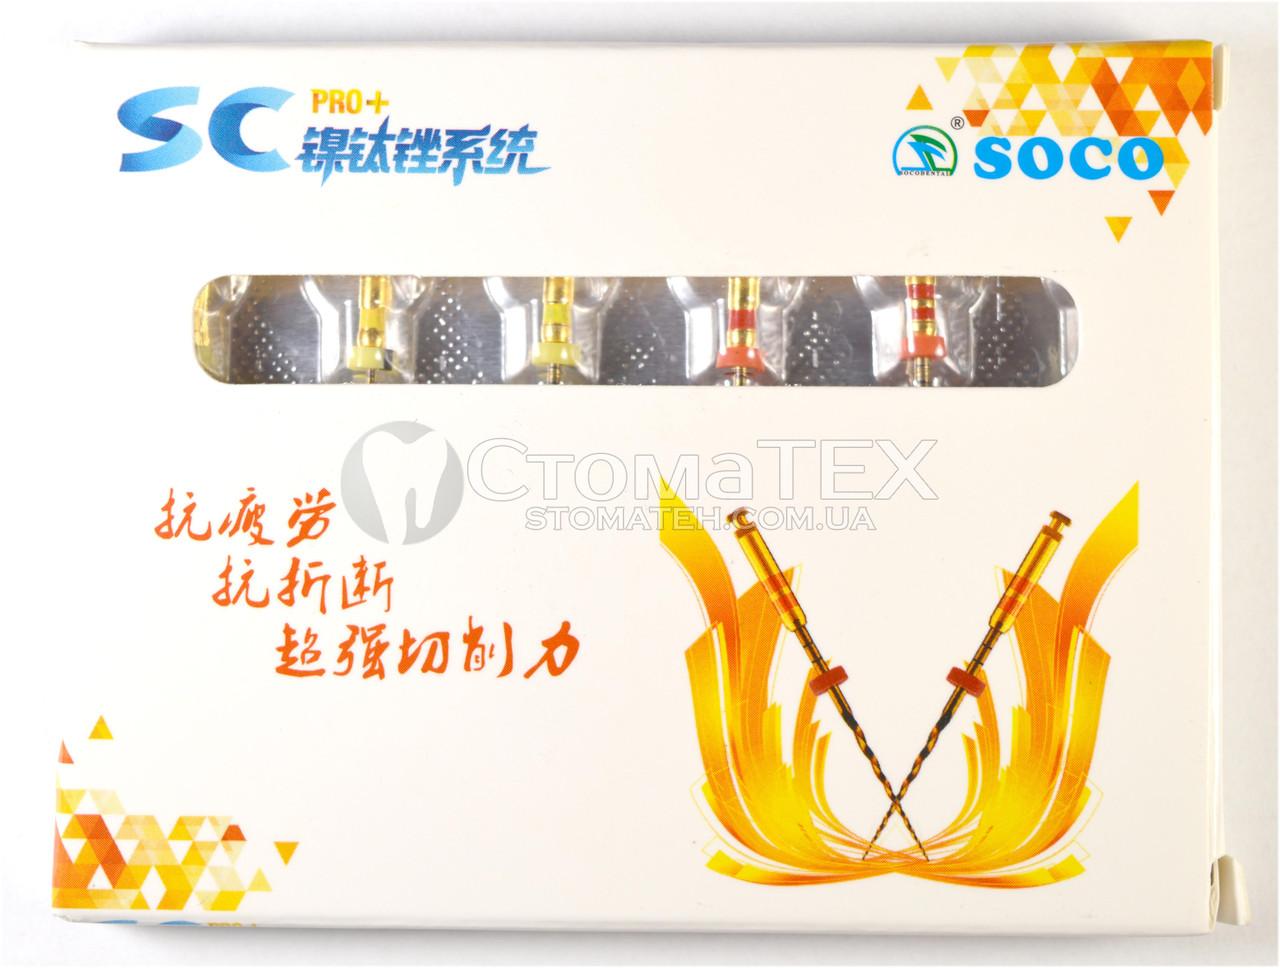 SC-Pro 21мм. ассорти, 6шт.